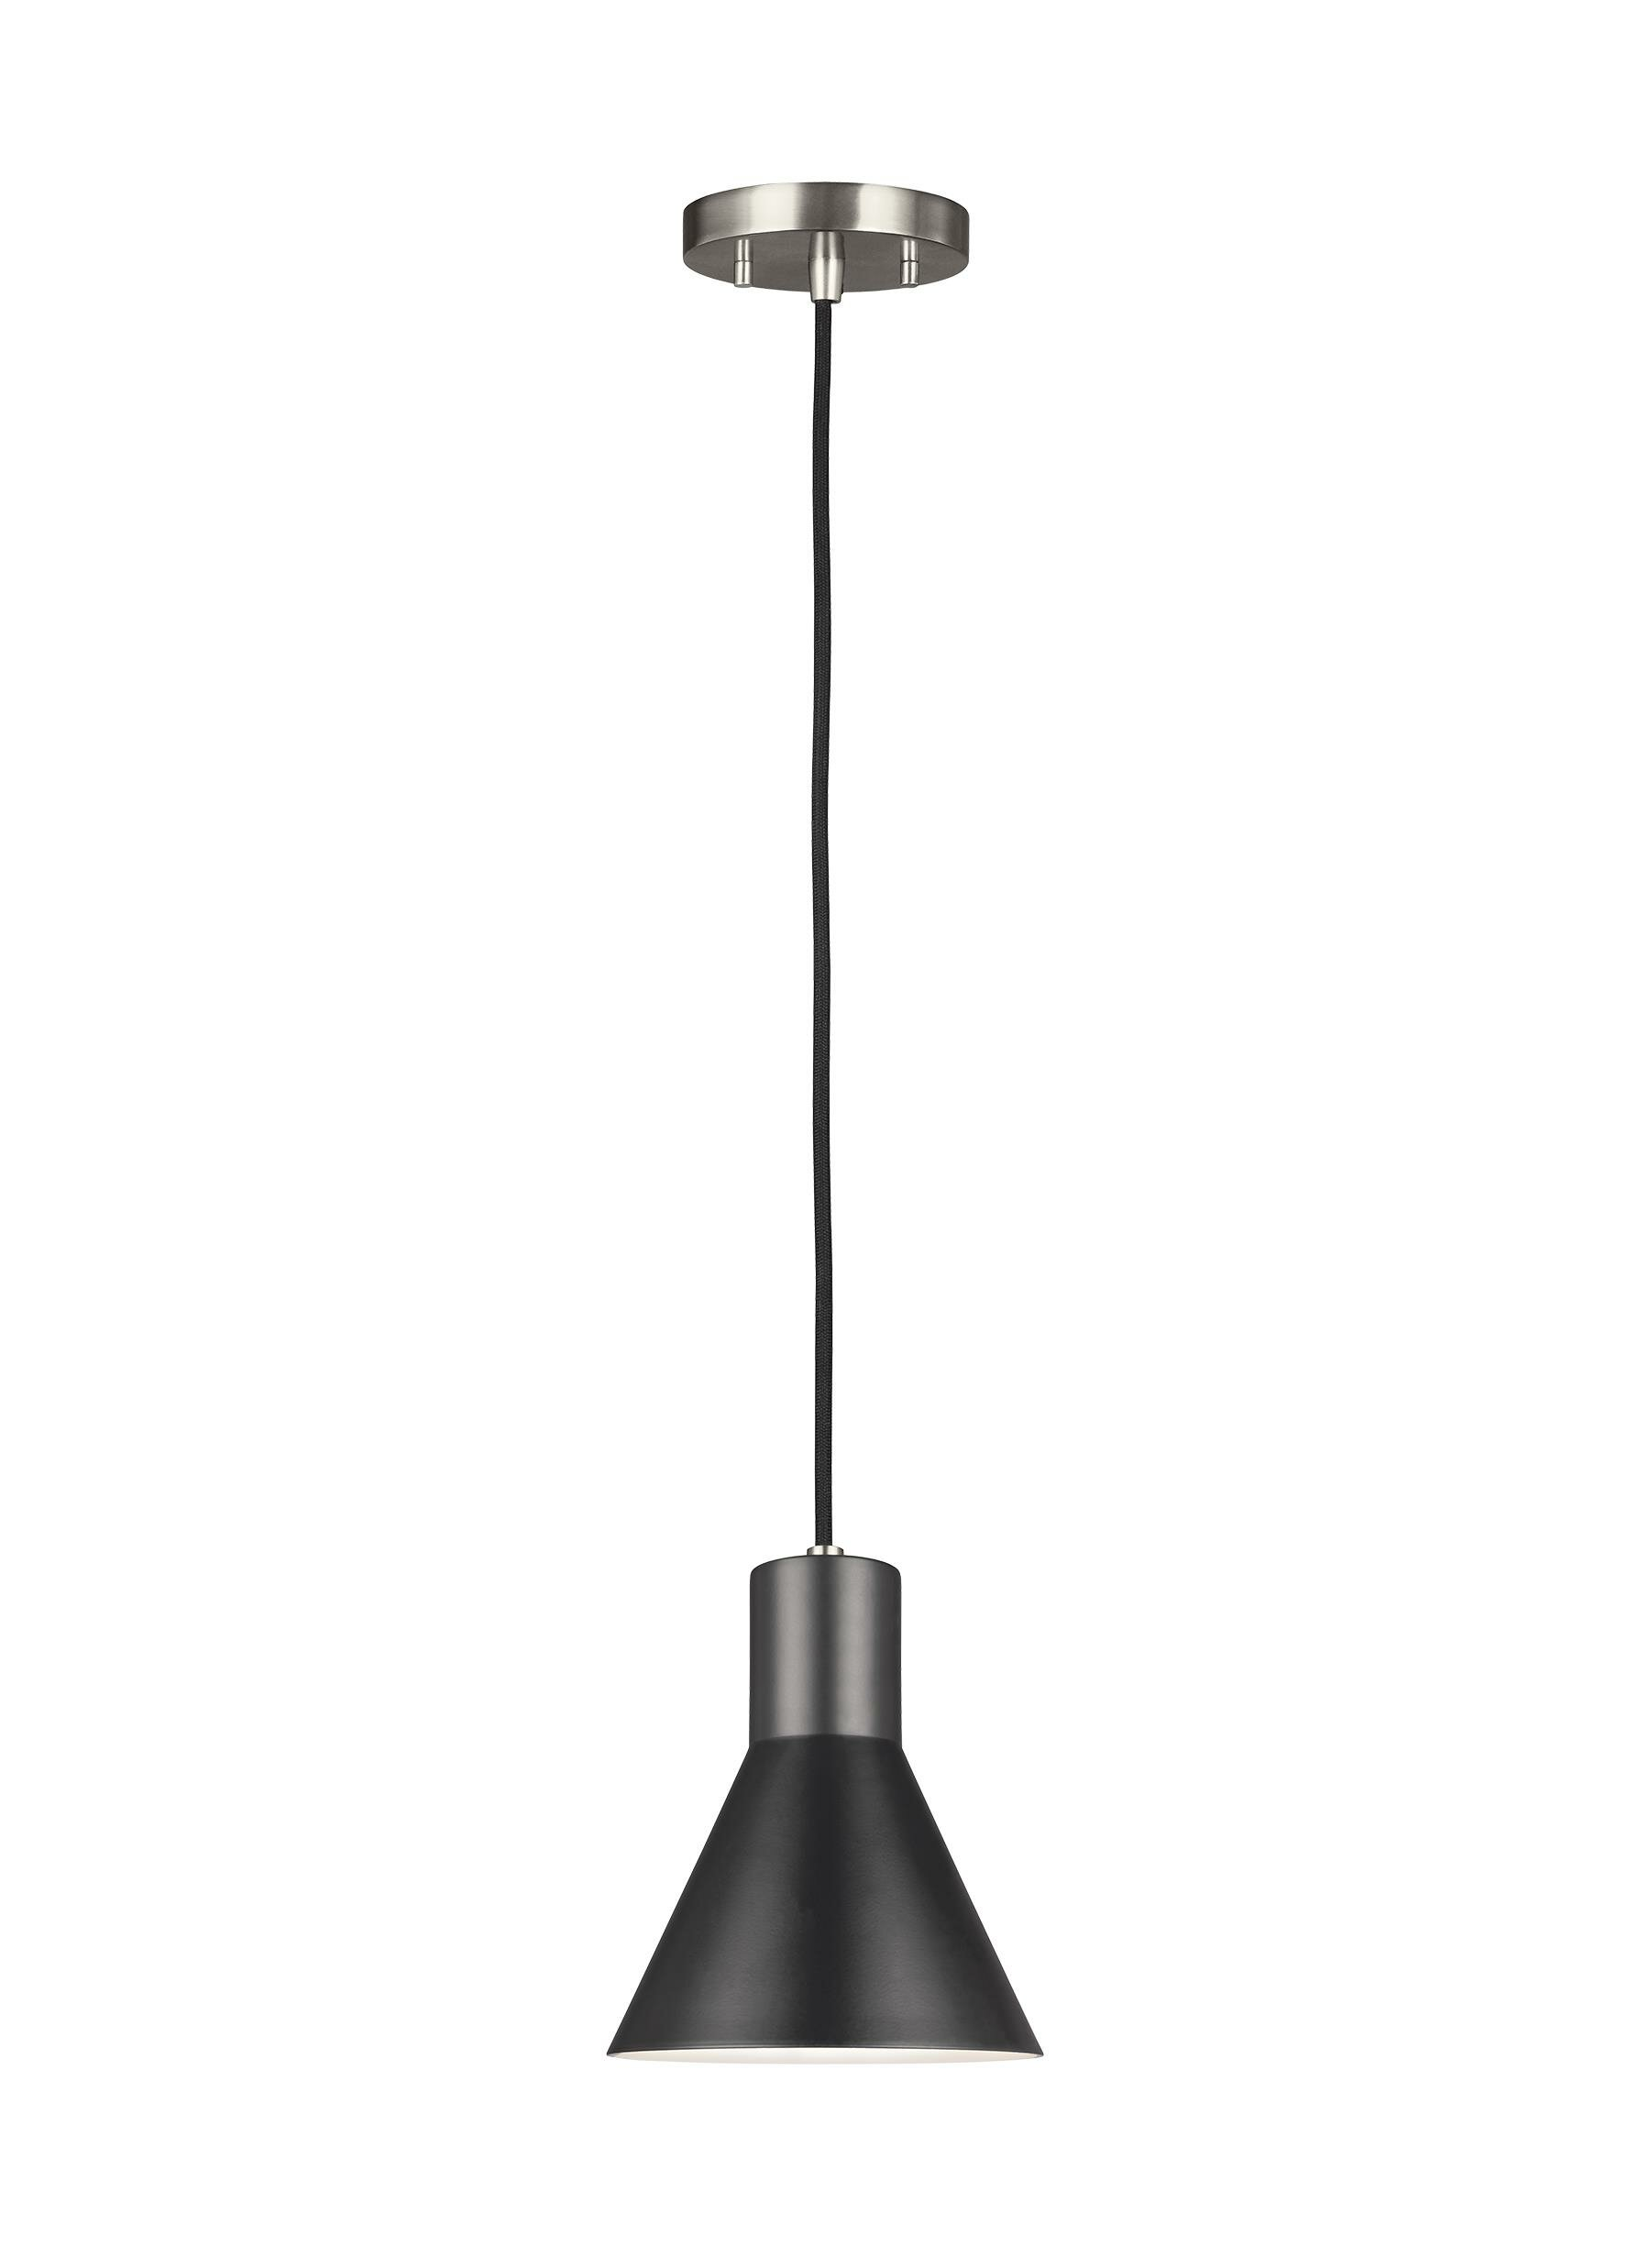 Image of: Alton 1 Light Cone Pendant Reviews Allmodern